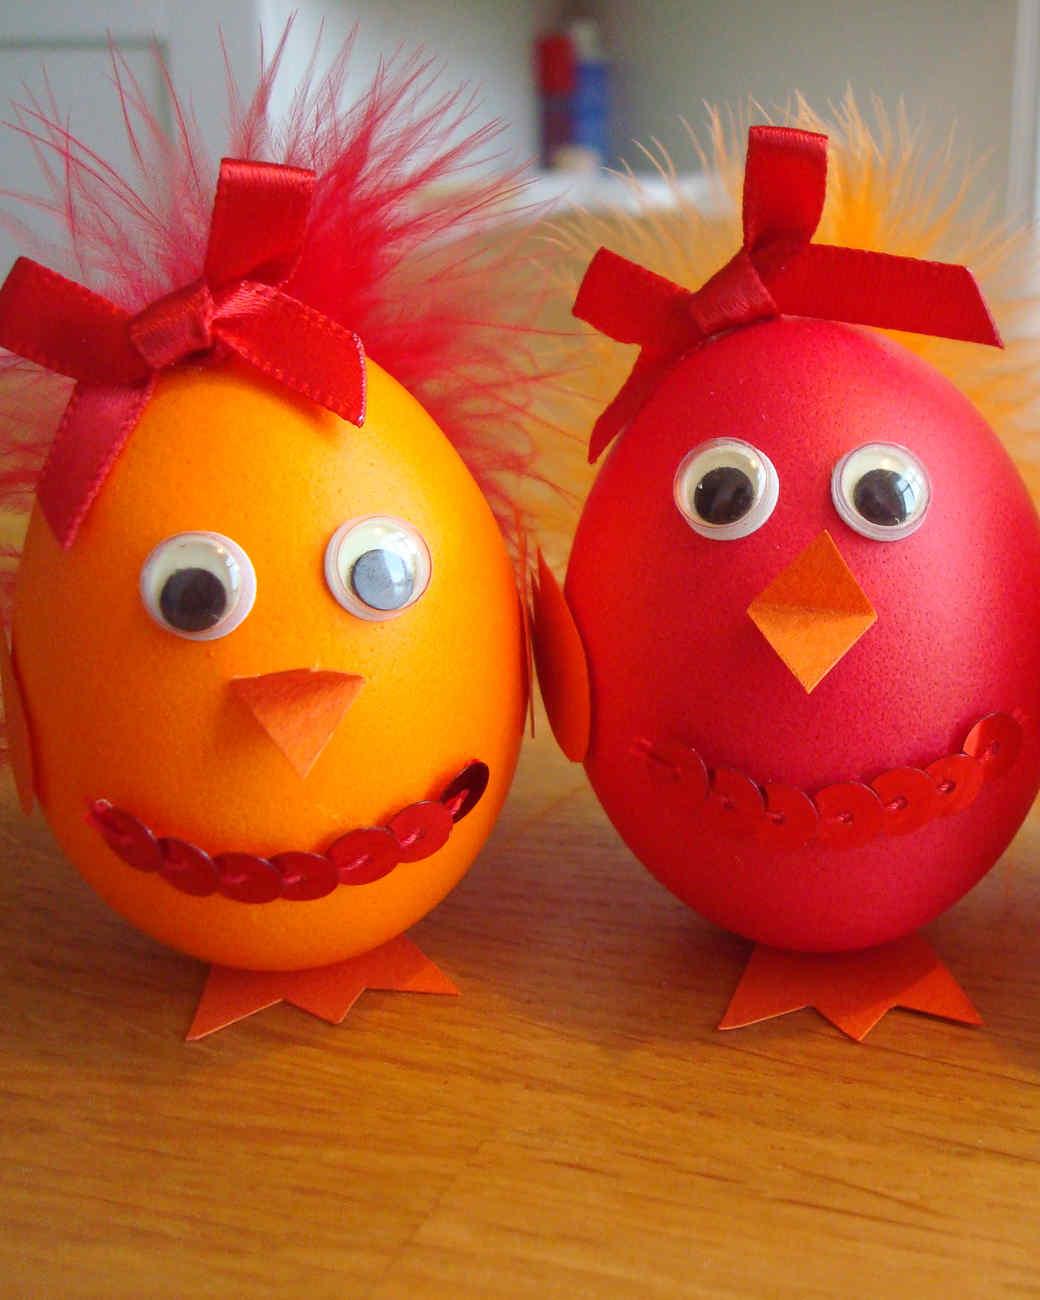 marthas-egg-hunt-radmila-curcic-0414.jpg